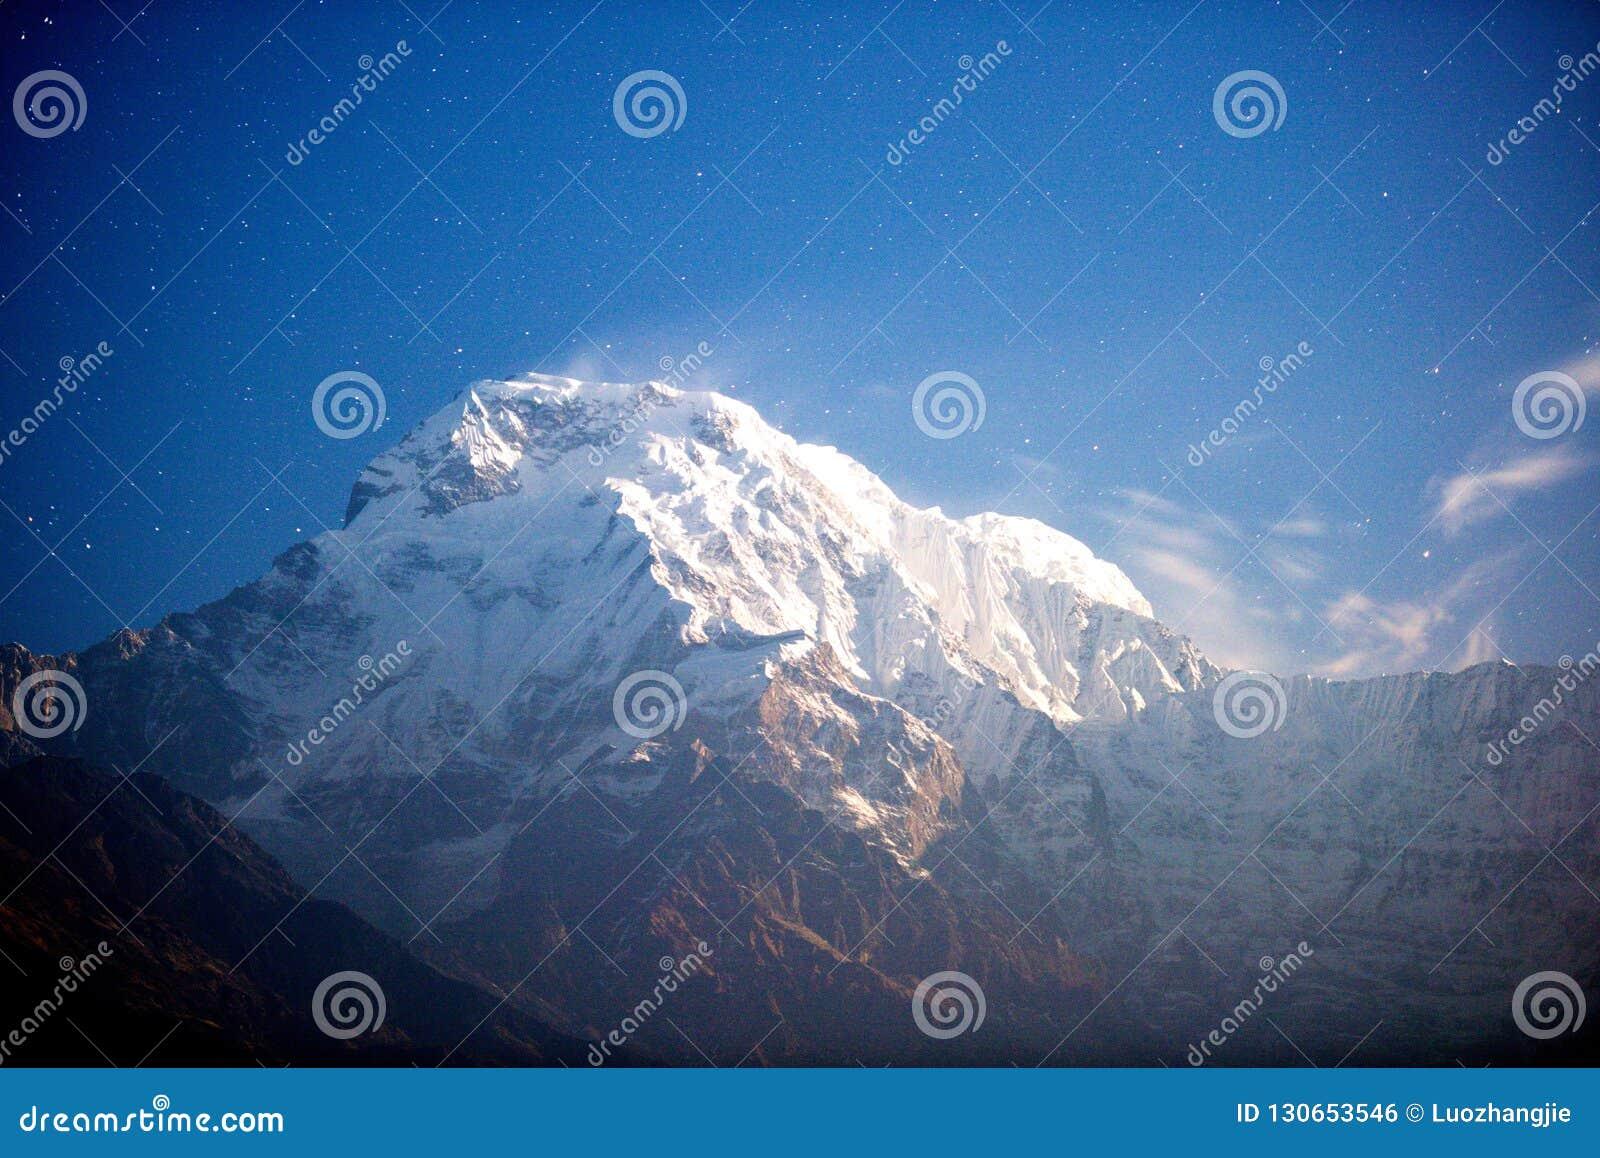 Annapurna summit at moonlight